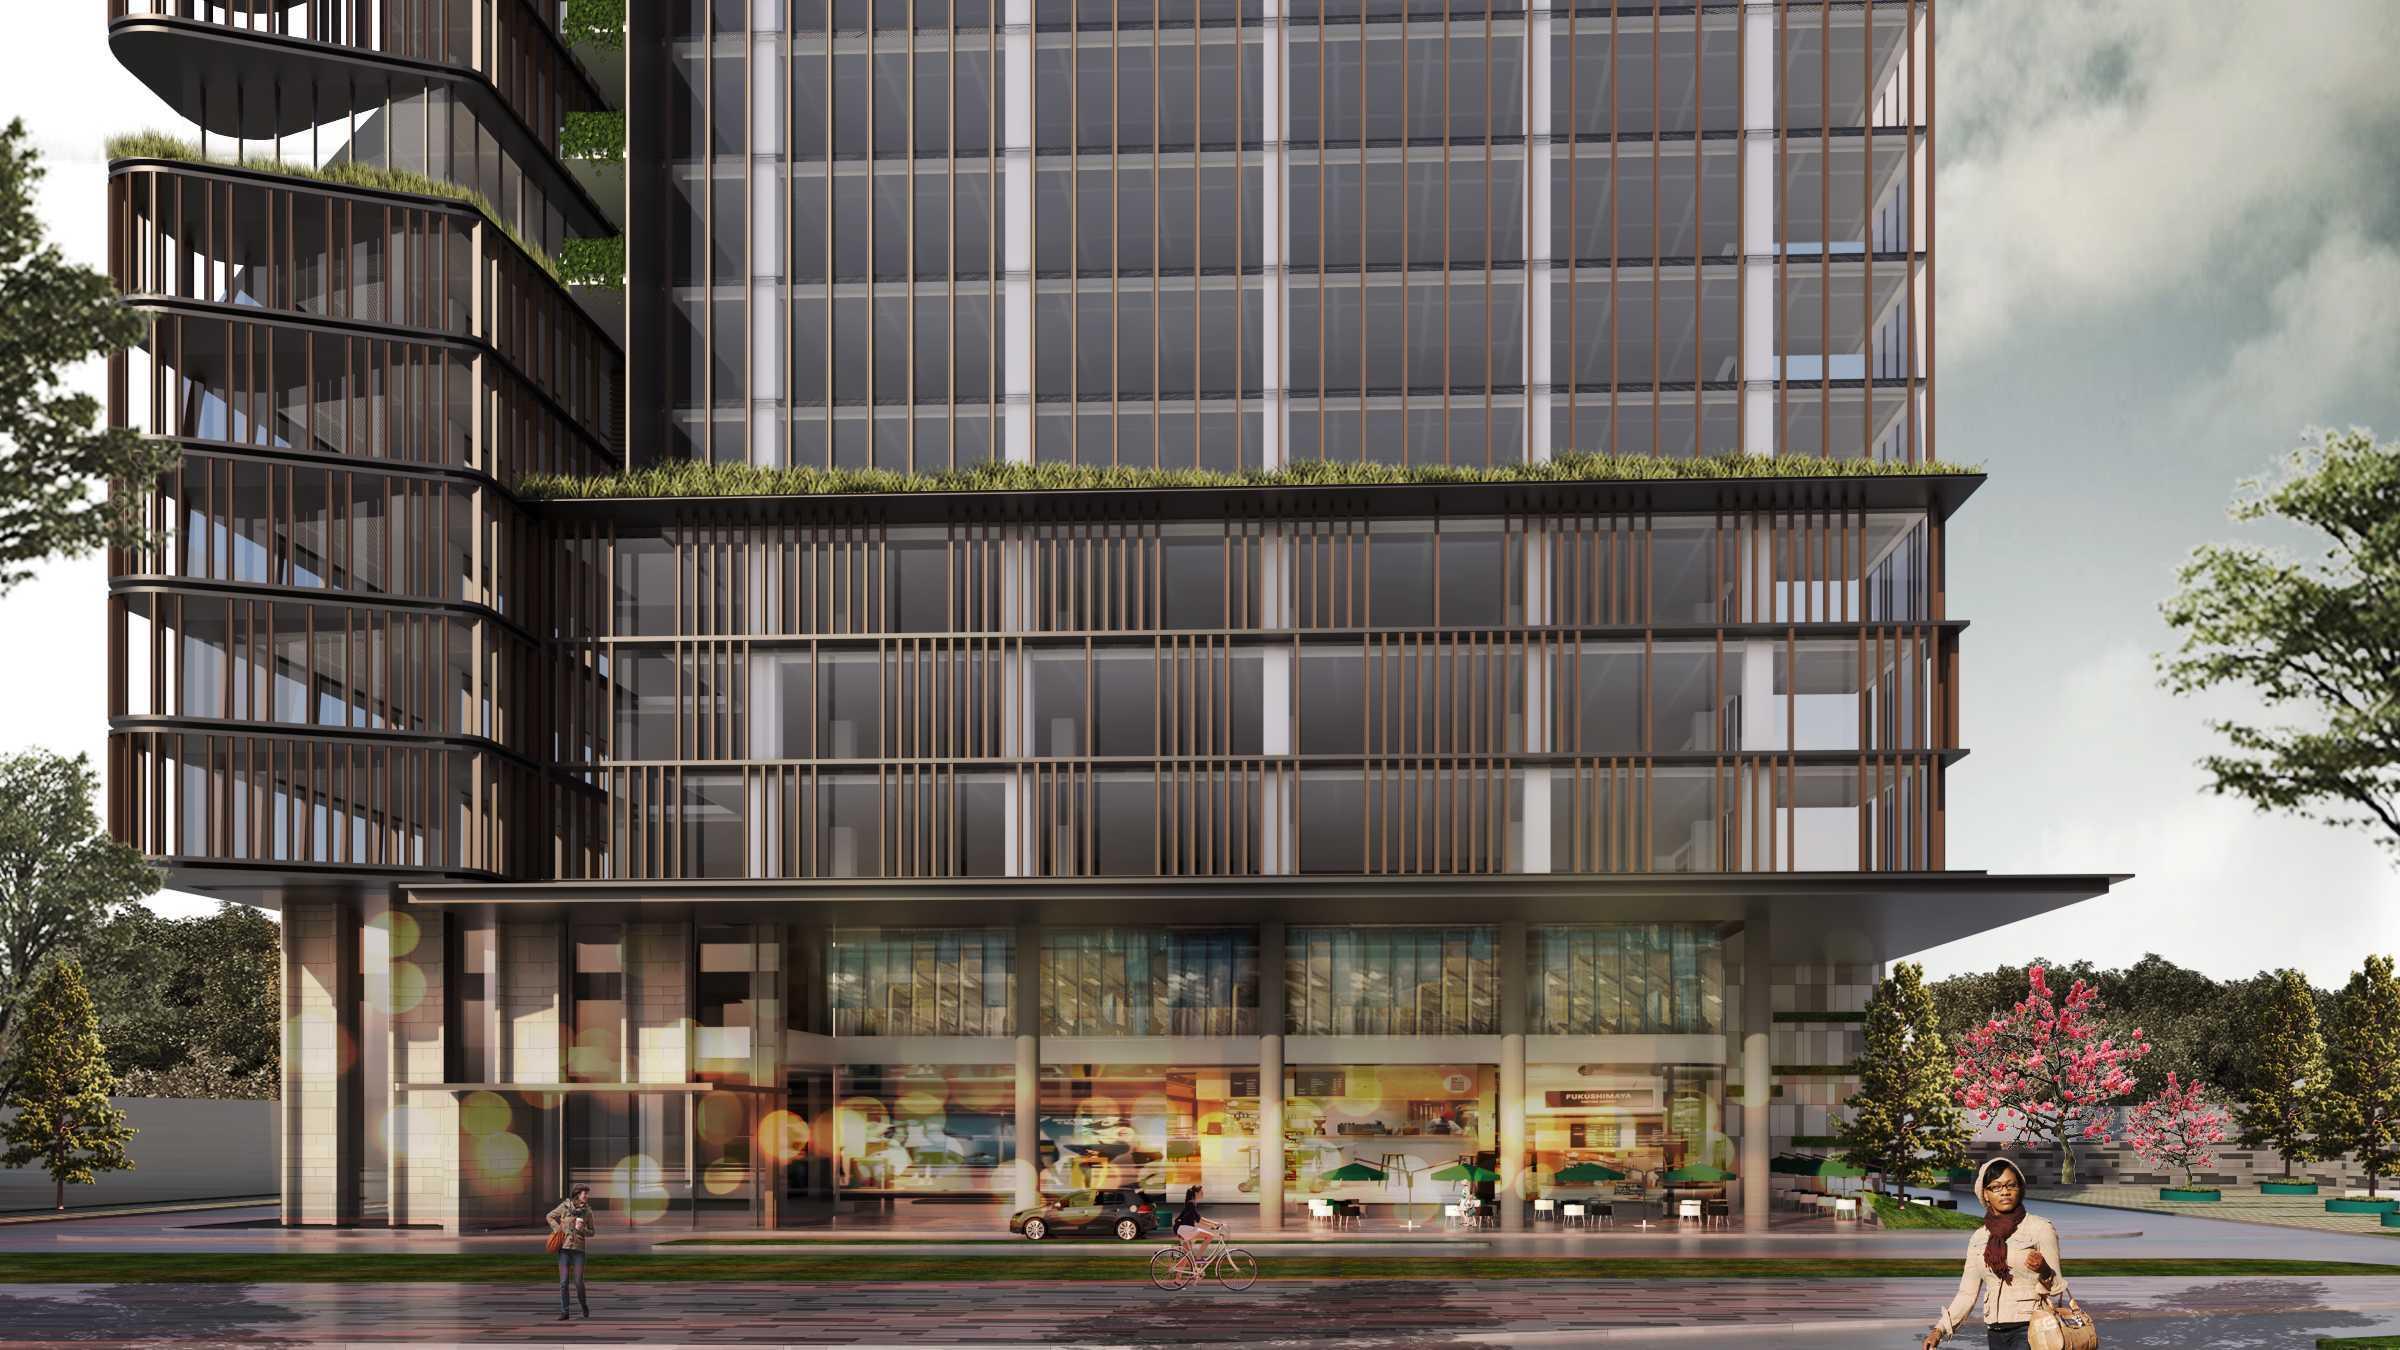 "Moi Architects Mt Office ""the Urban Canopy"" Jakarta, Daerah Khusus Ibukota Jakarta, Indonesia Jakarta, Daerah Khusus Ibukota Jakarta, Indonesia Moi-Architects-Mt-Office-The-Urban-Canopy   59033"